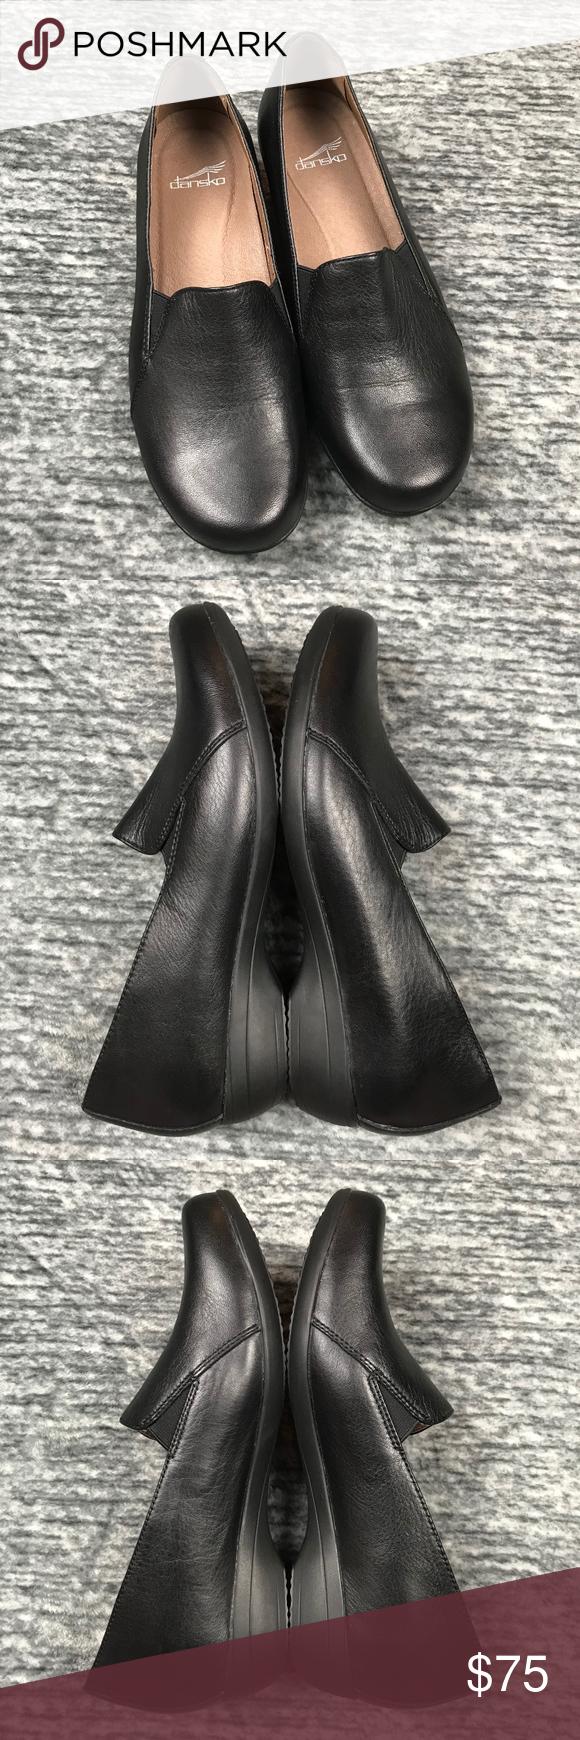 Dansko Leather Farah Black Milled Napa